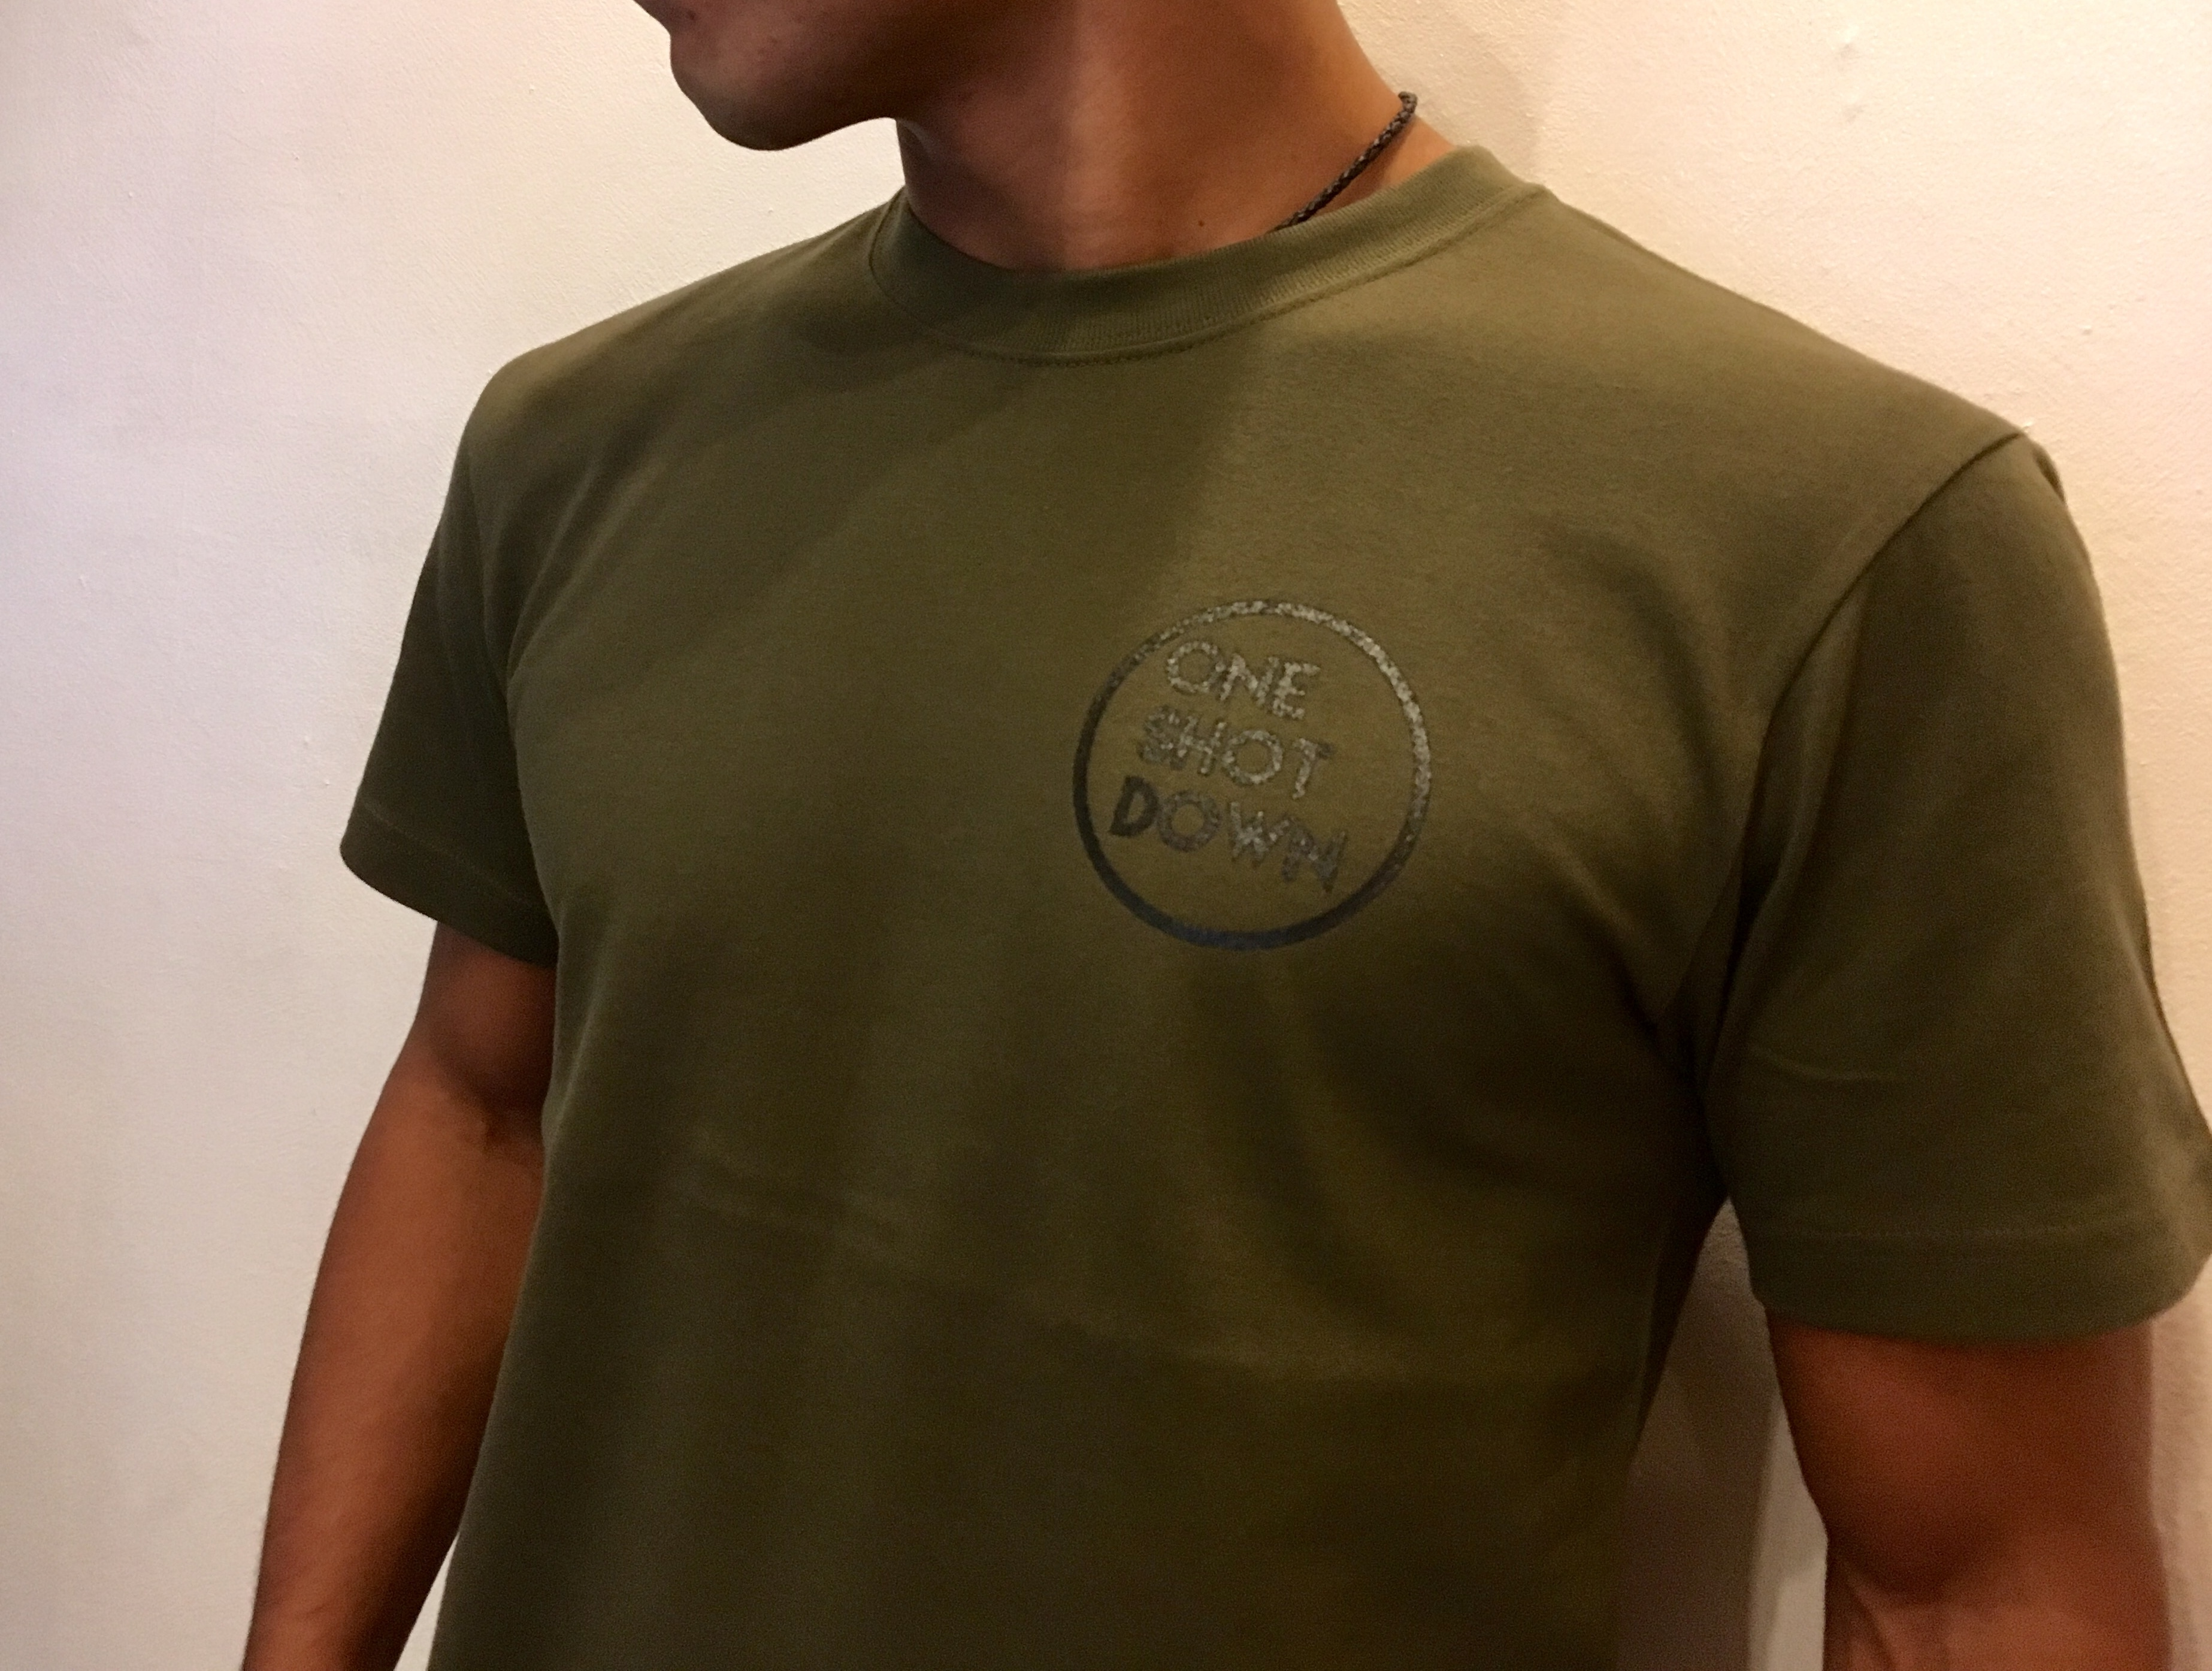 ONESHOTDOWN サークルロゴ Tシャツ - 画像4